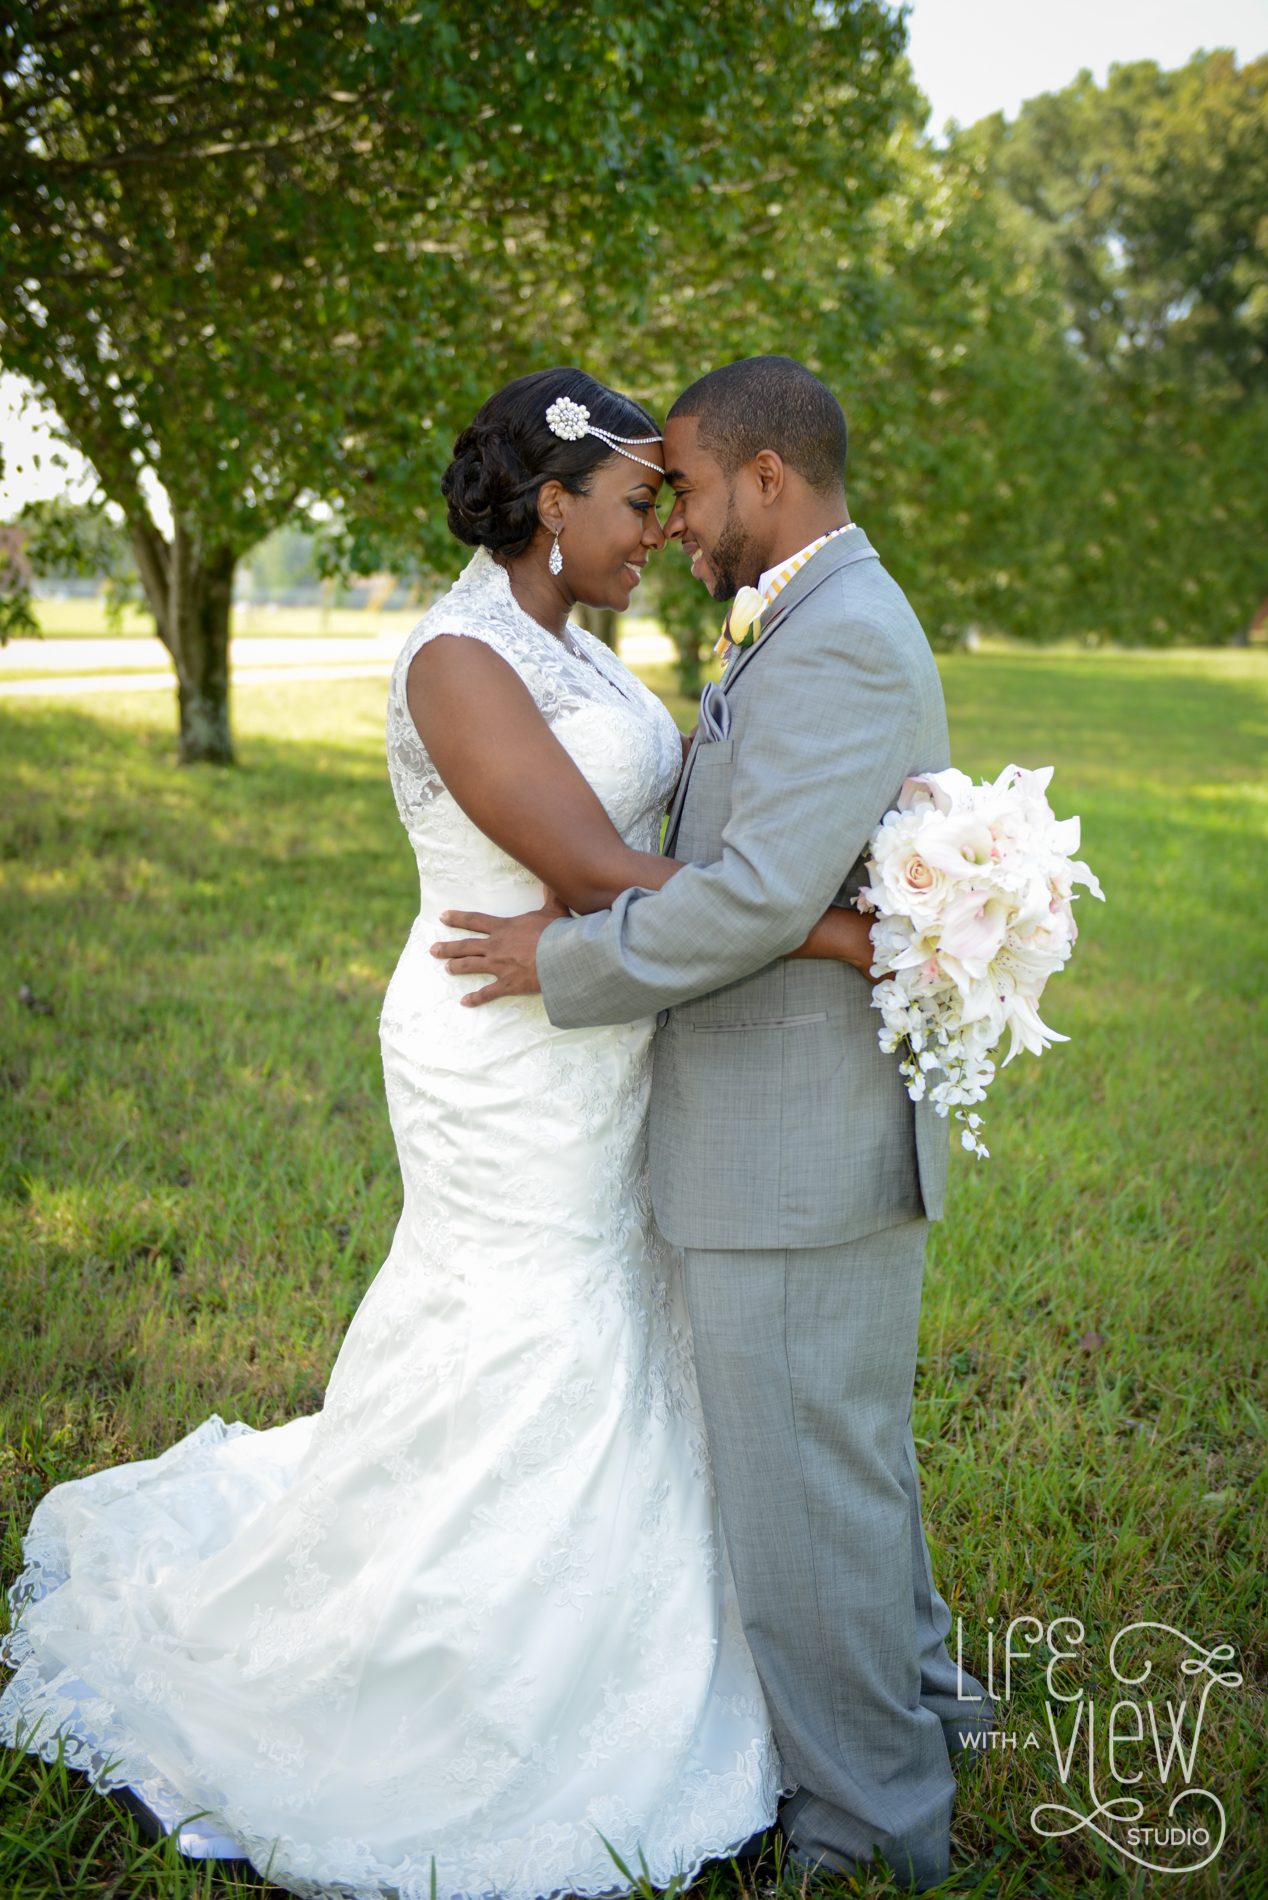 Stratton-Hall-Wedding-17.jpg